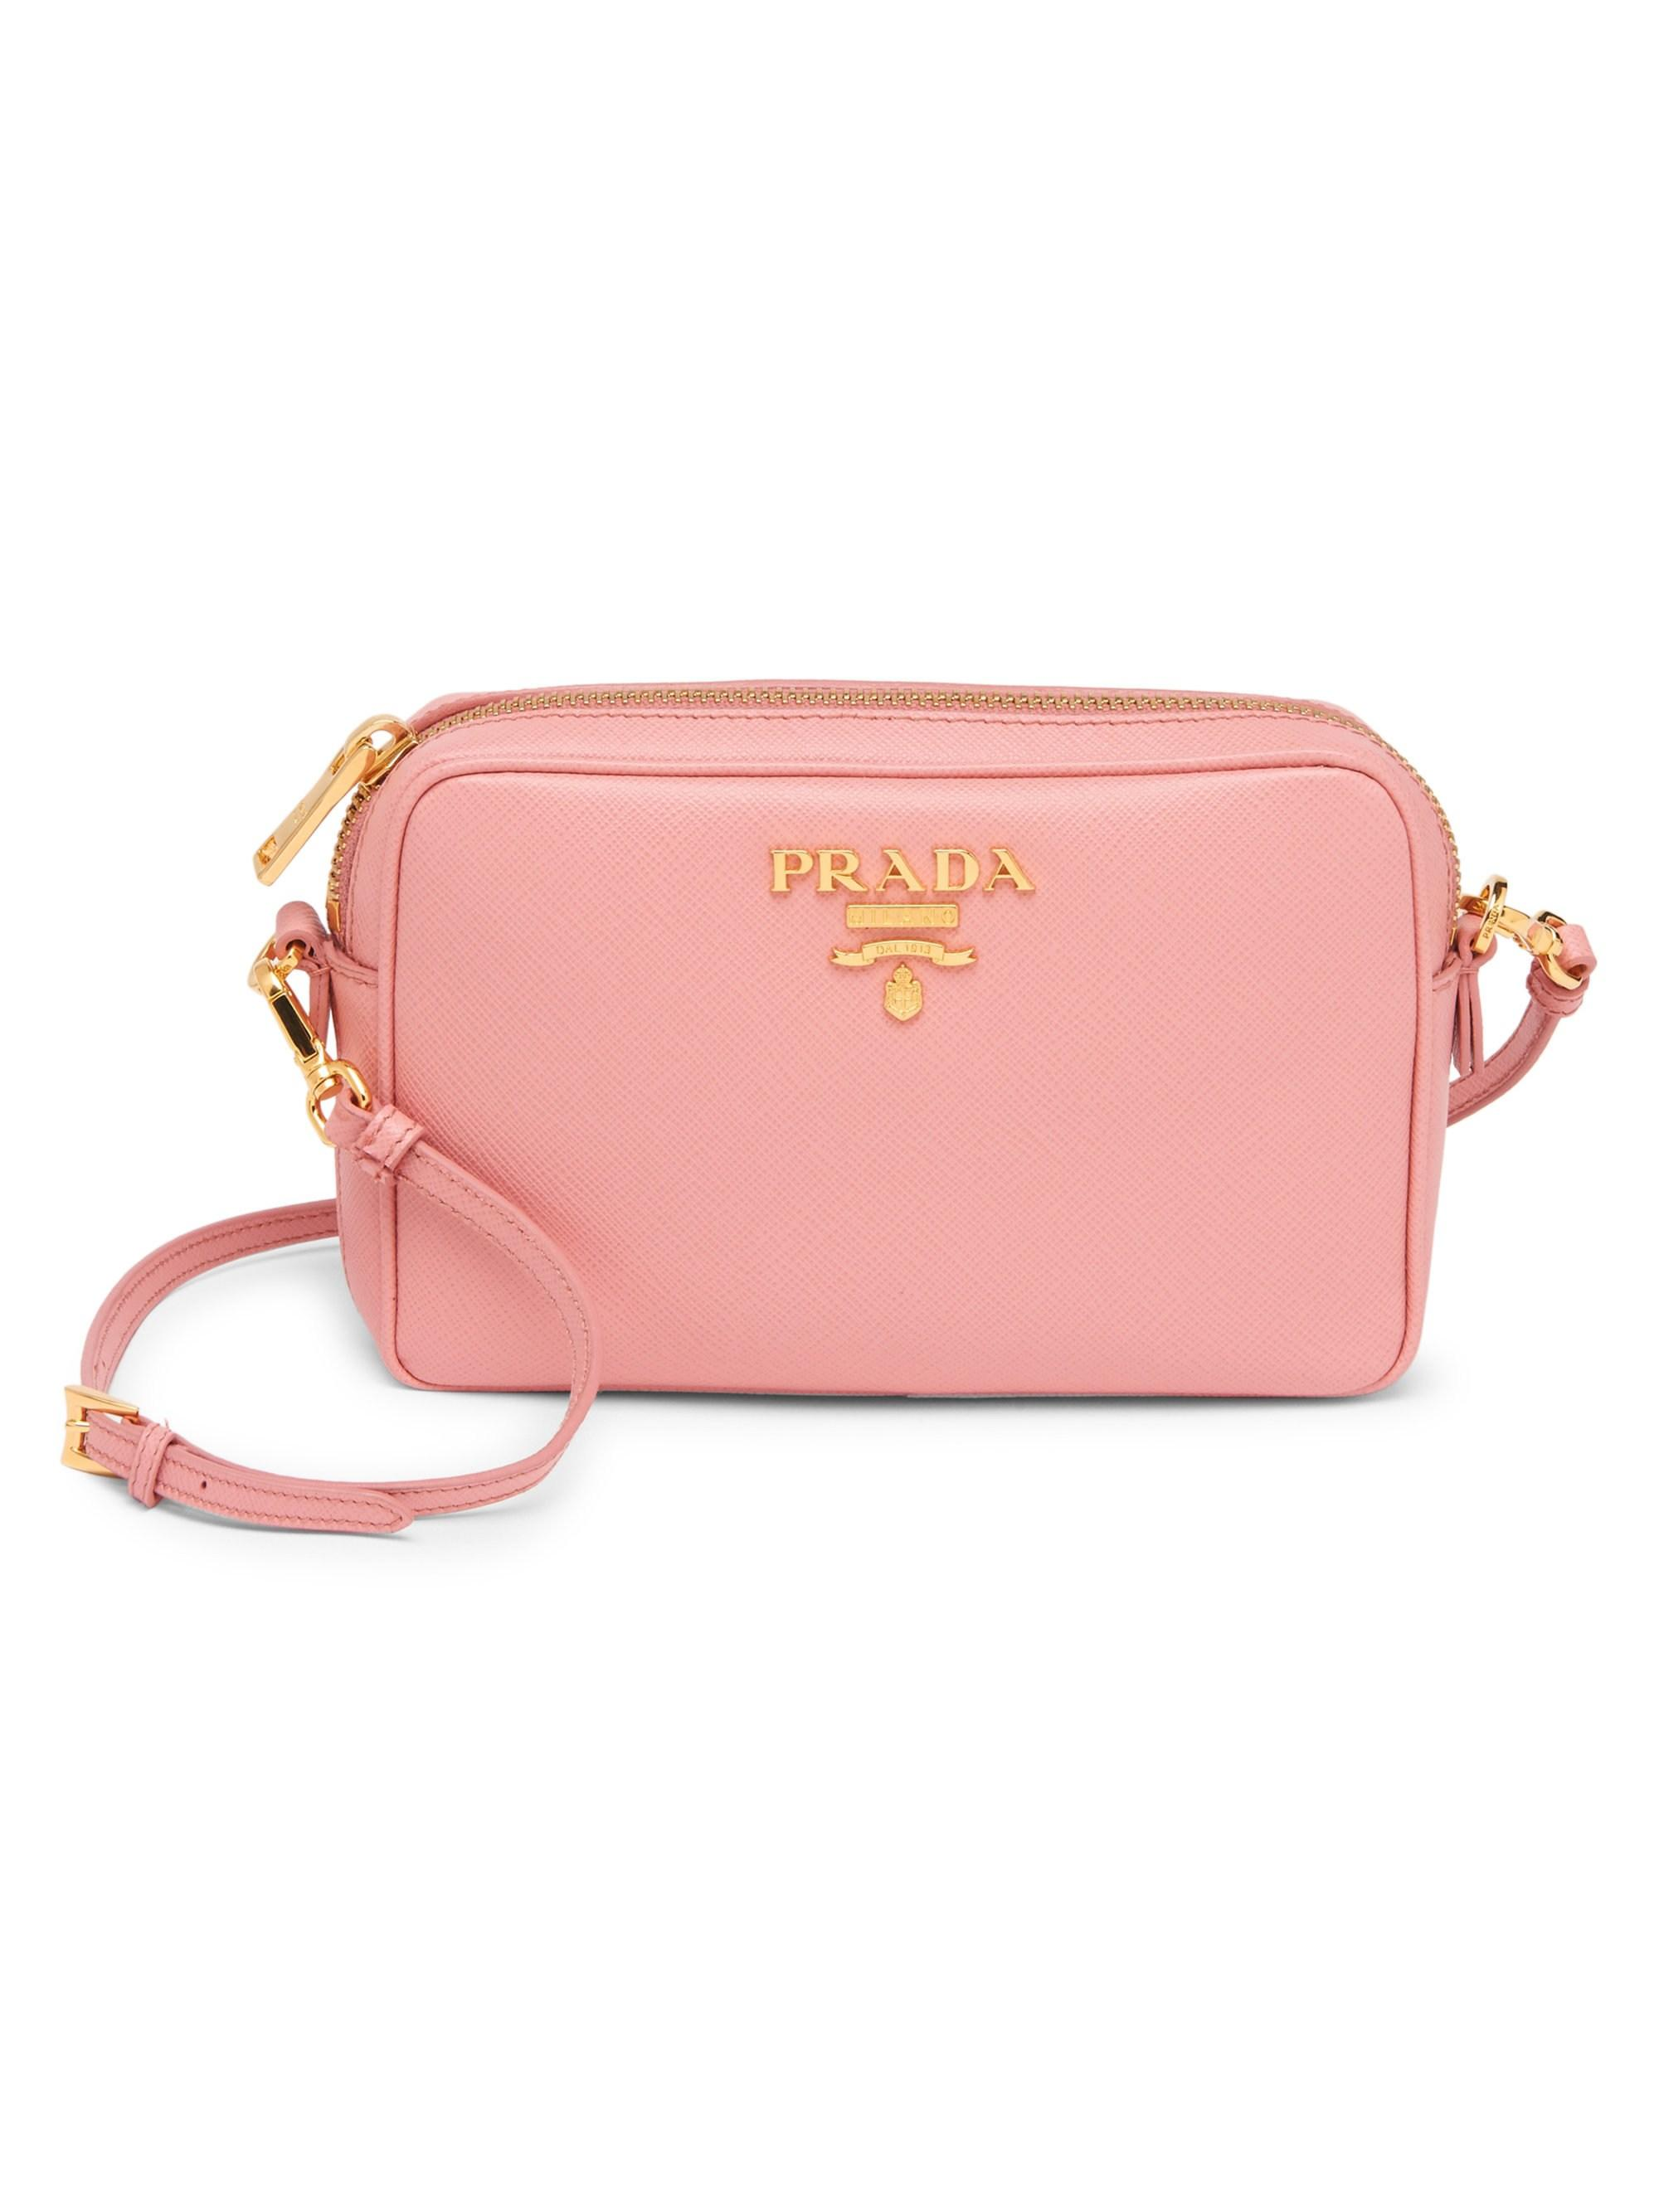 6f4cc6b0cf4d Lyst - Prada Women's Saffiano Camera Bag - Pink in Pink